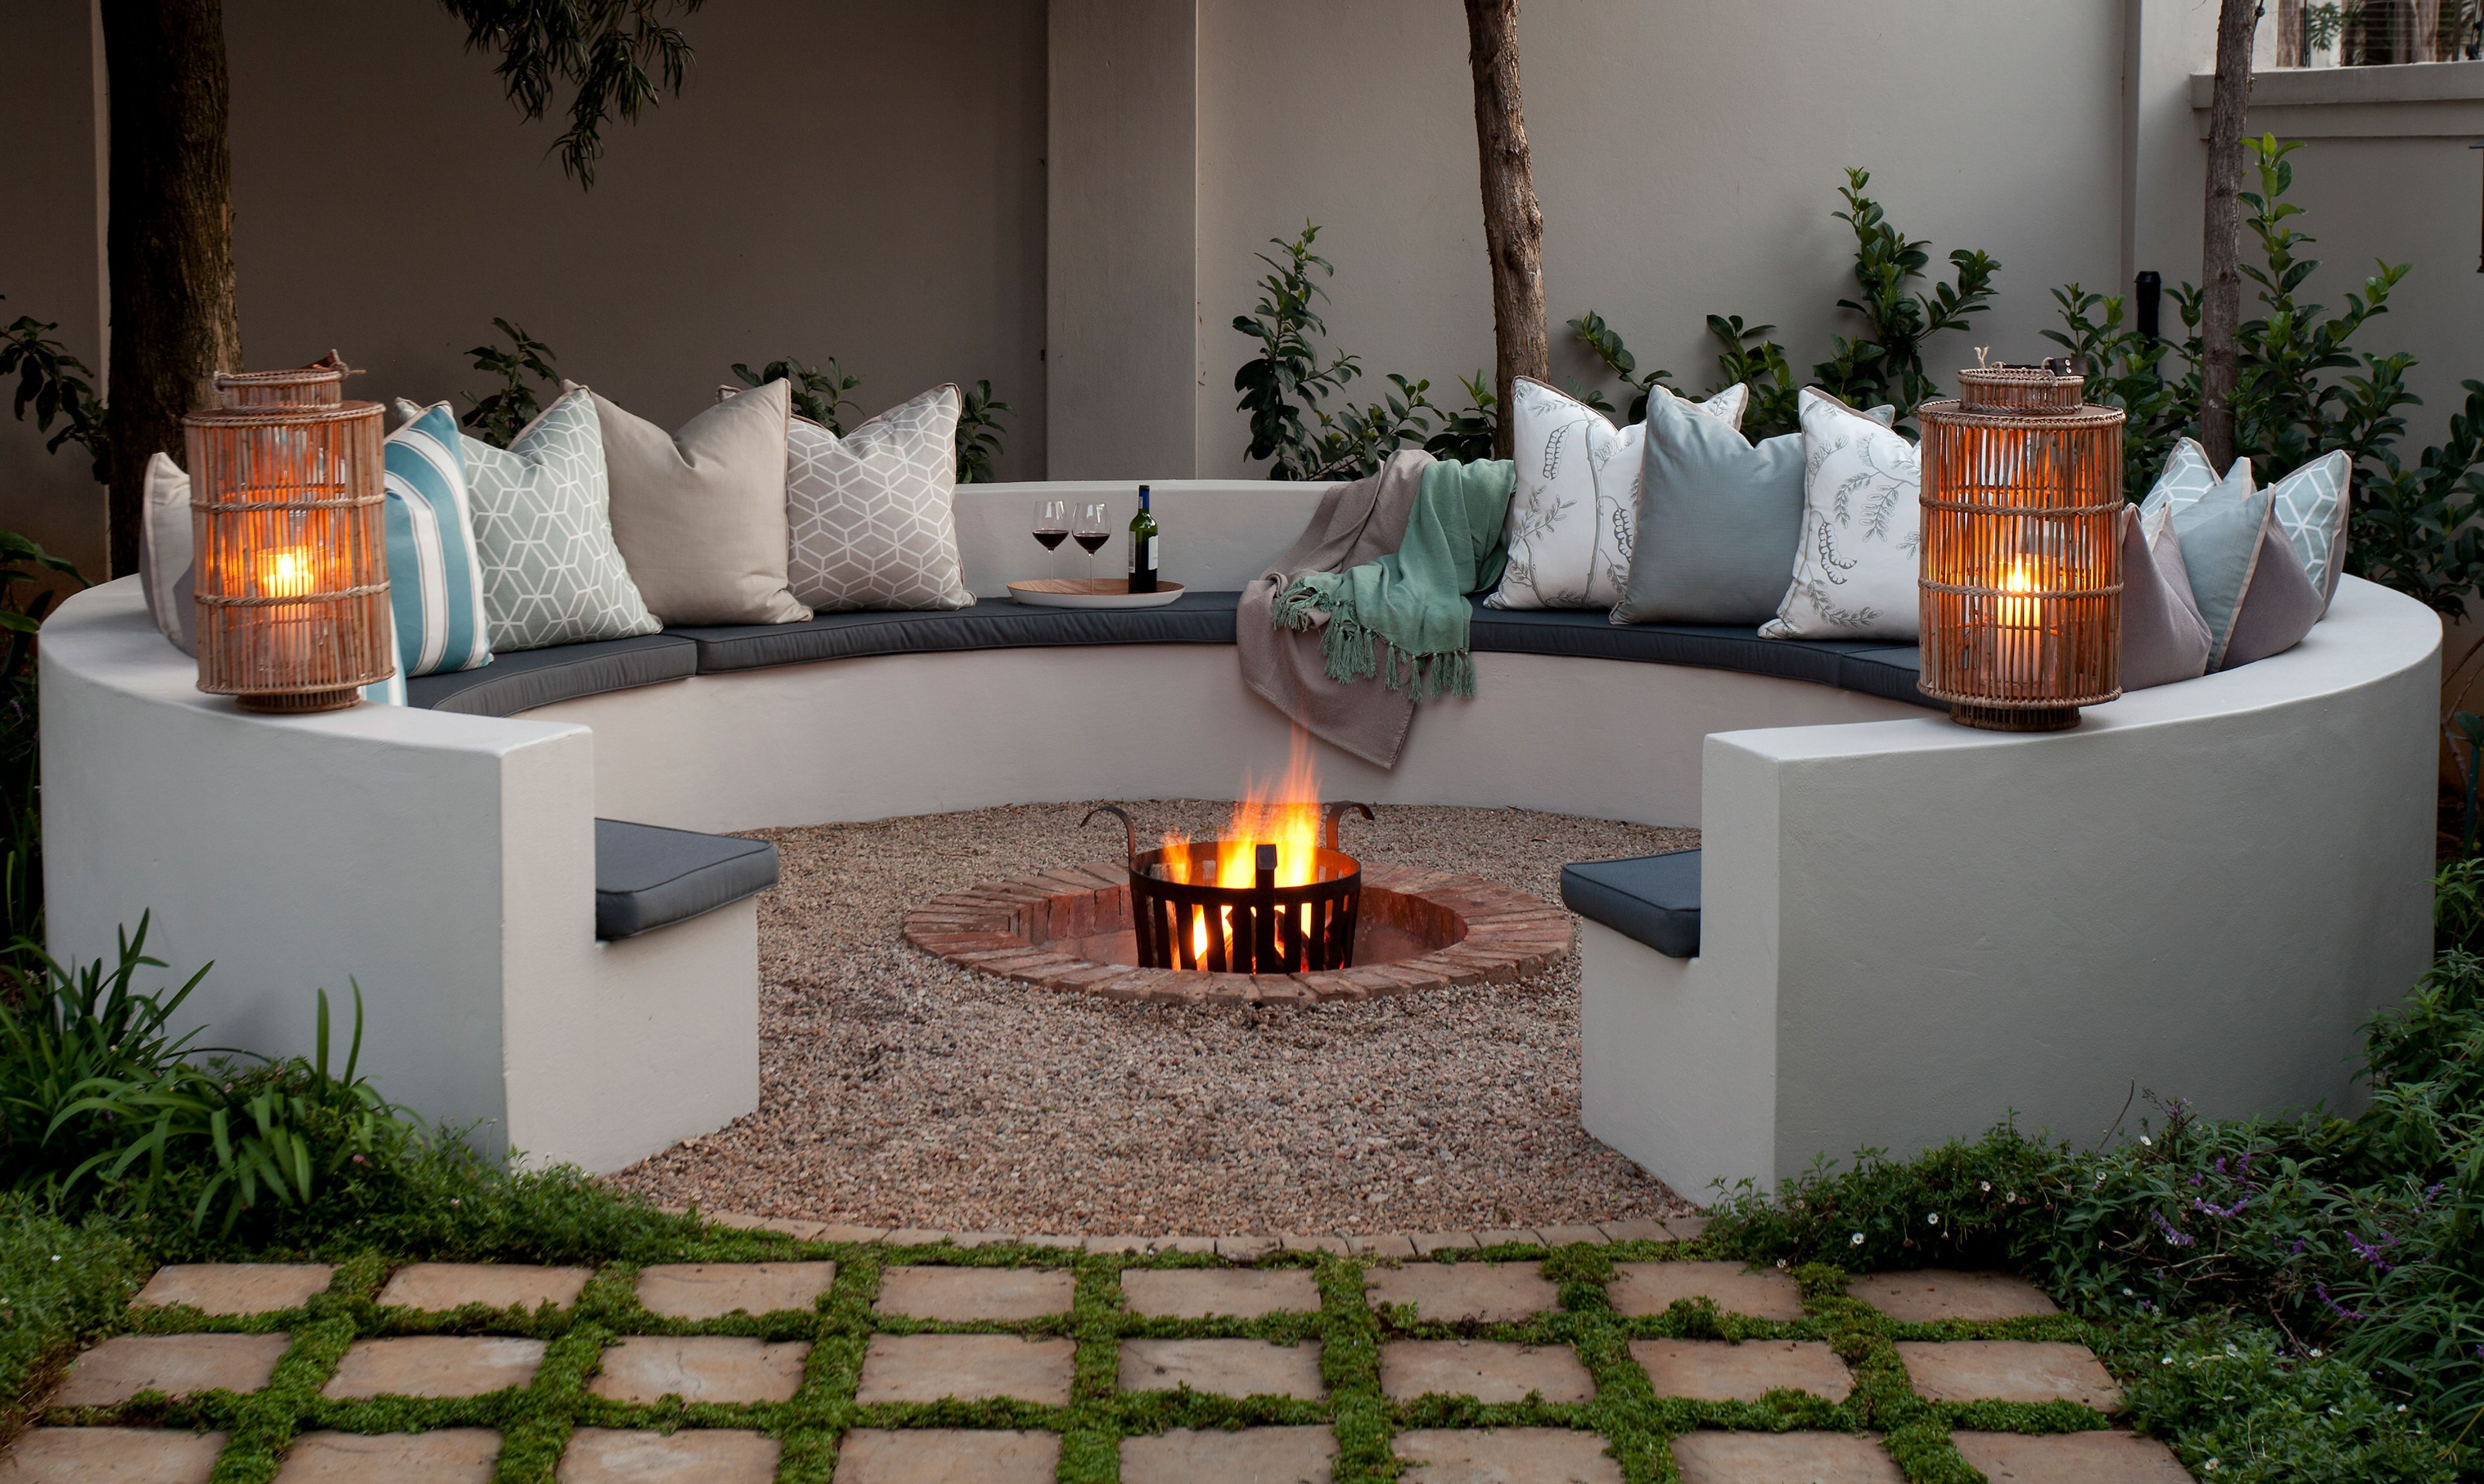 Photo of 17 Inspiring DIY Fire Pit Design Ideas To Improve Your Backyard